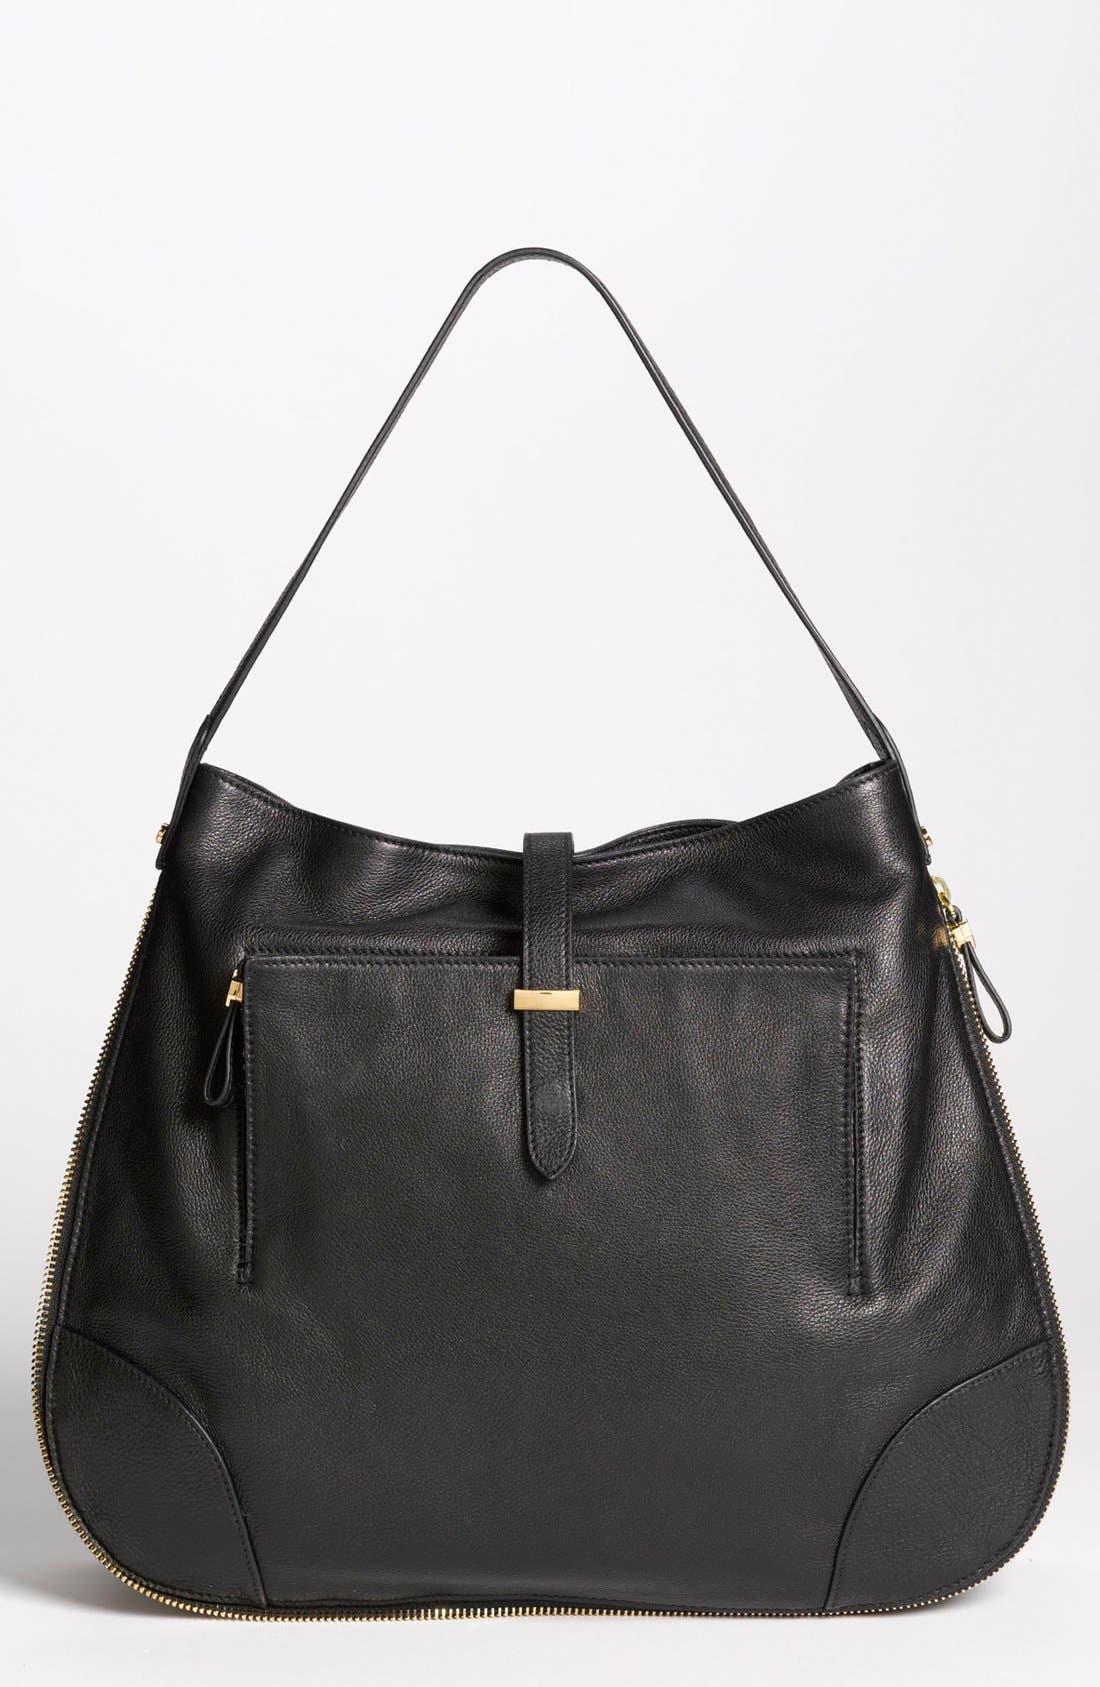 Main Image - Tory Burch 'Clay - Classic' Leather Hobo